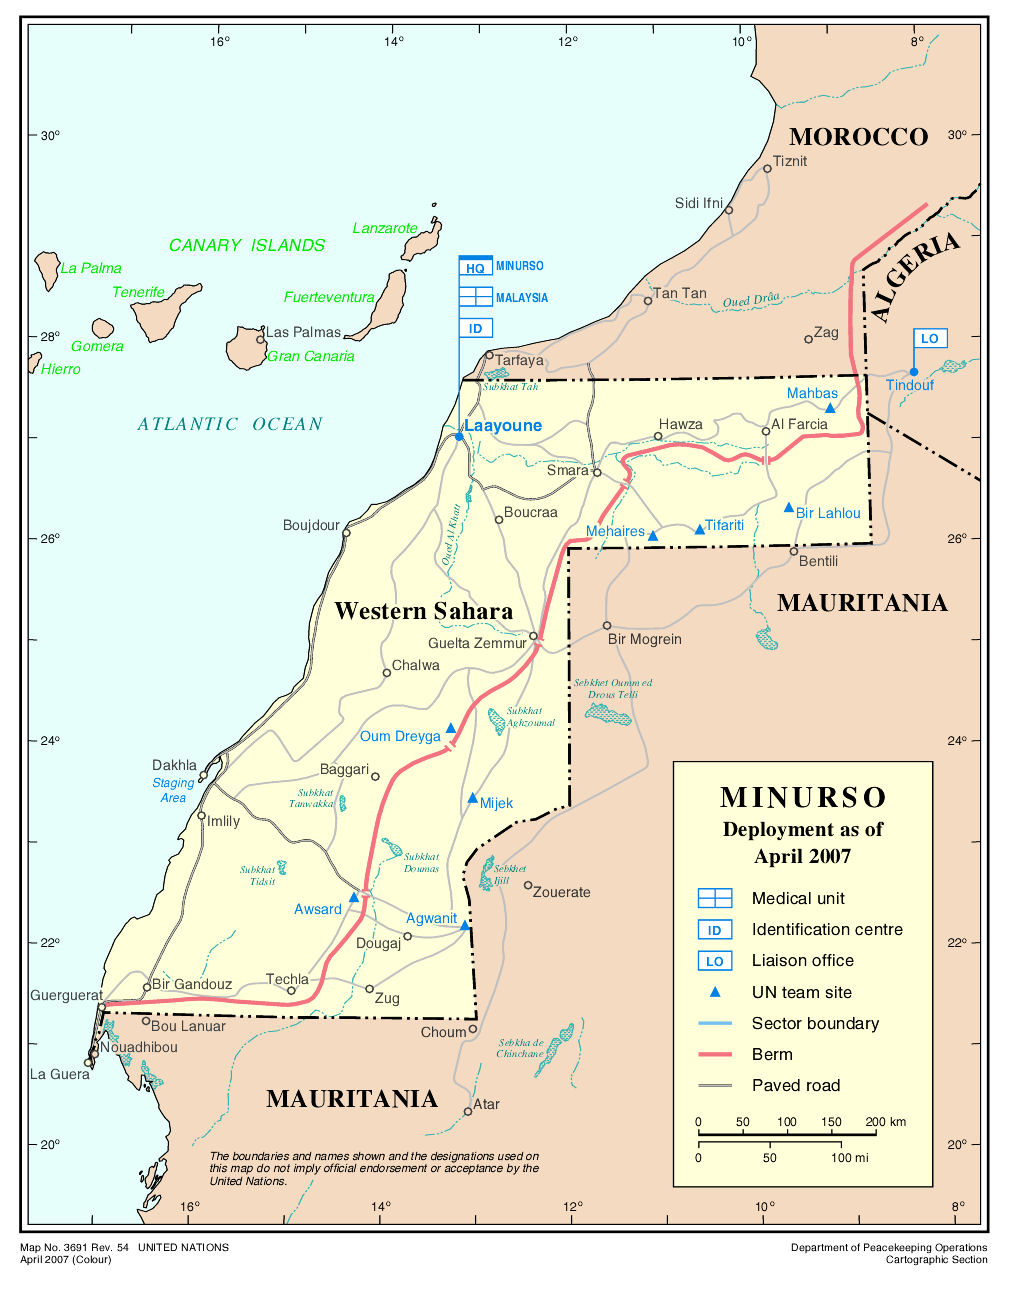 mapa del sahara occidental (minurso 2007)